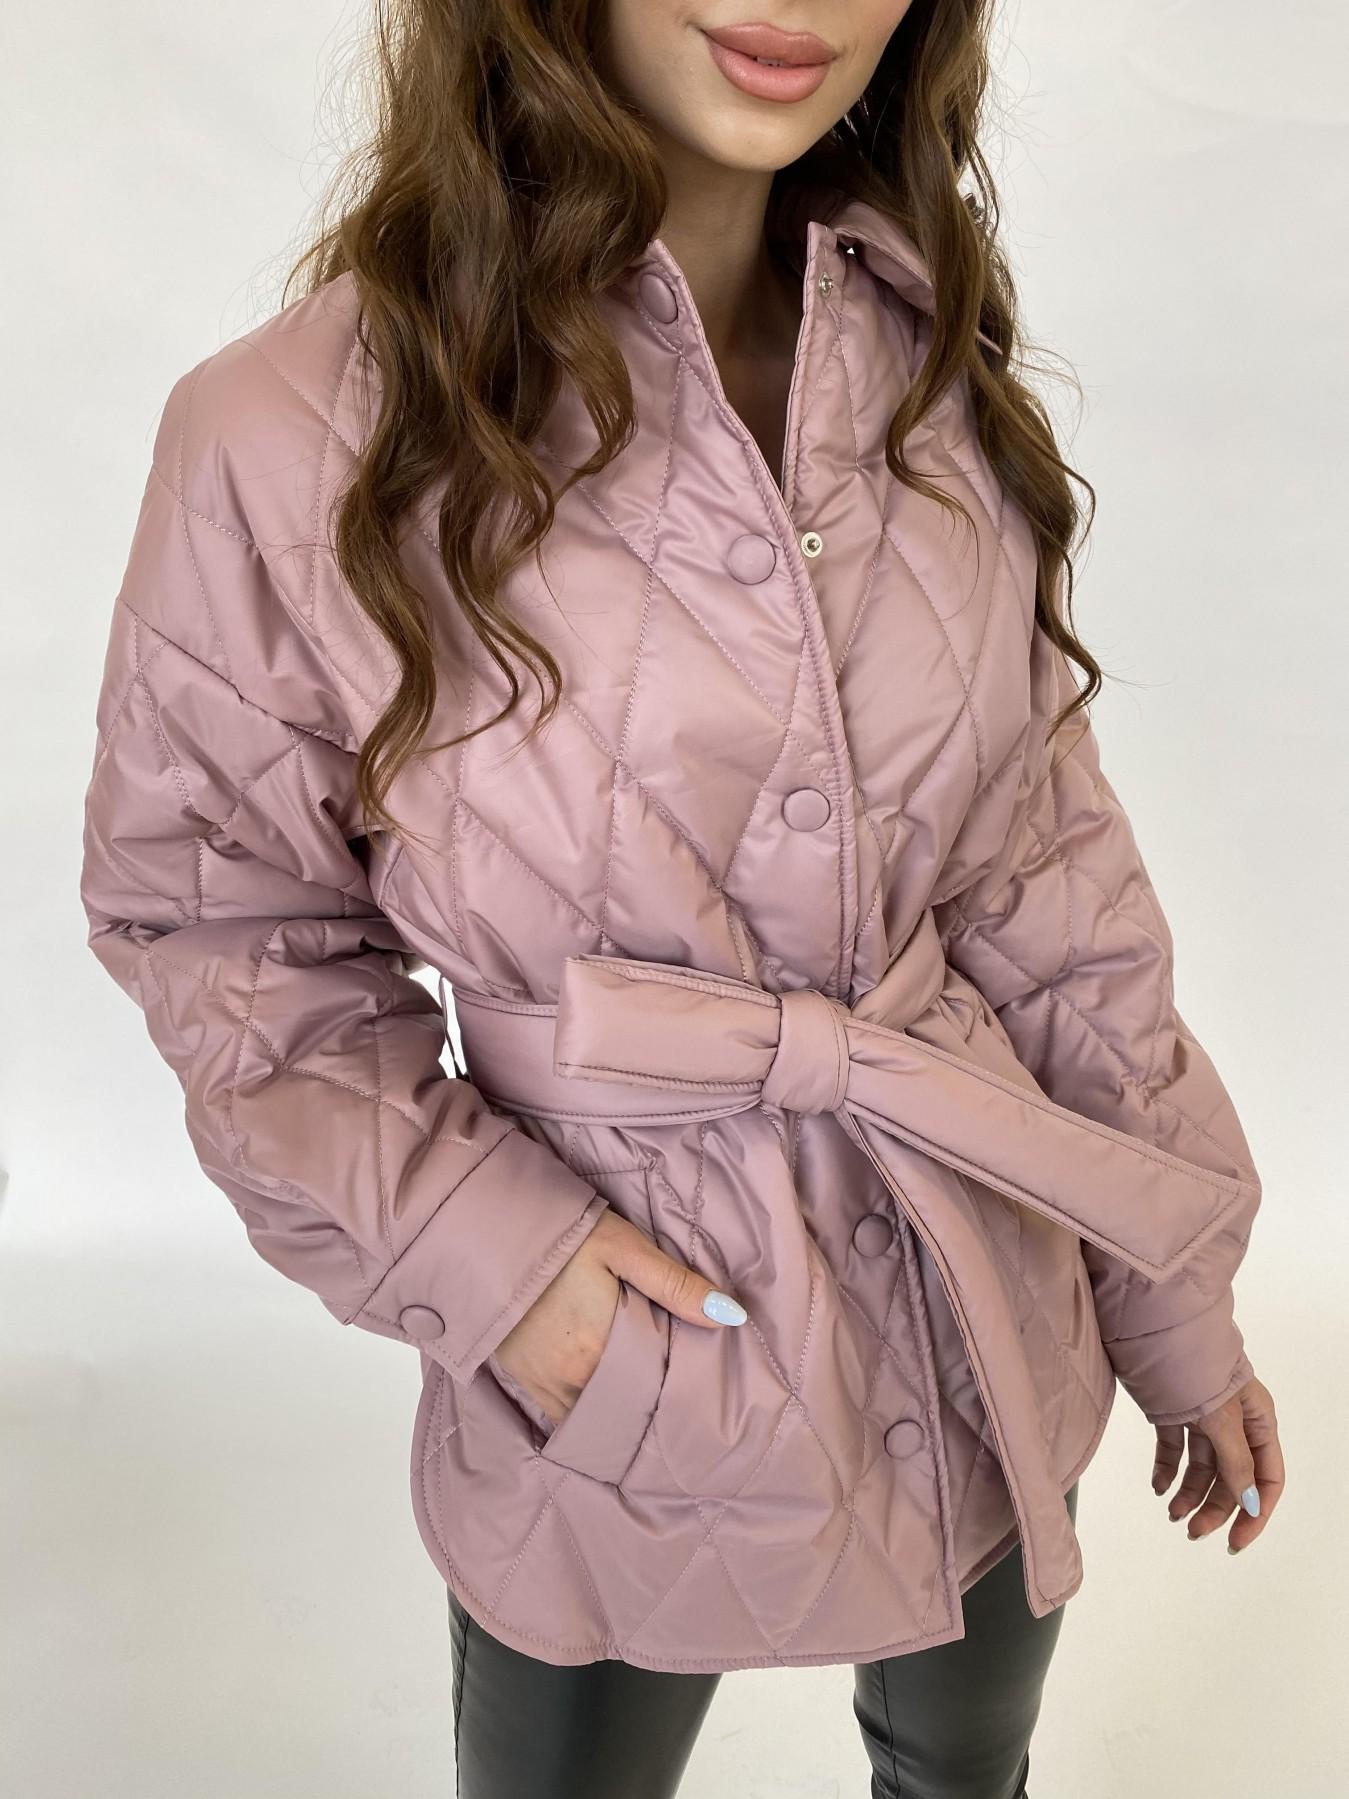 Моно  куртка из плащевой ткани Gloria 11081 АРТ. 47647 Цвет: Пудра - фото 6, интернет магазин tm-modus.ru